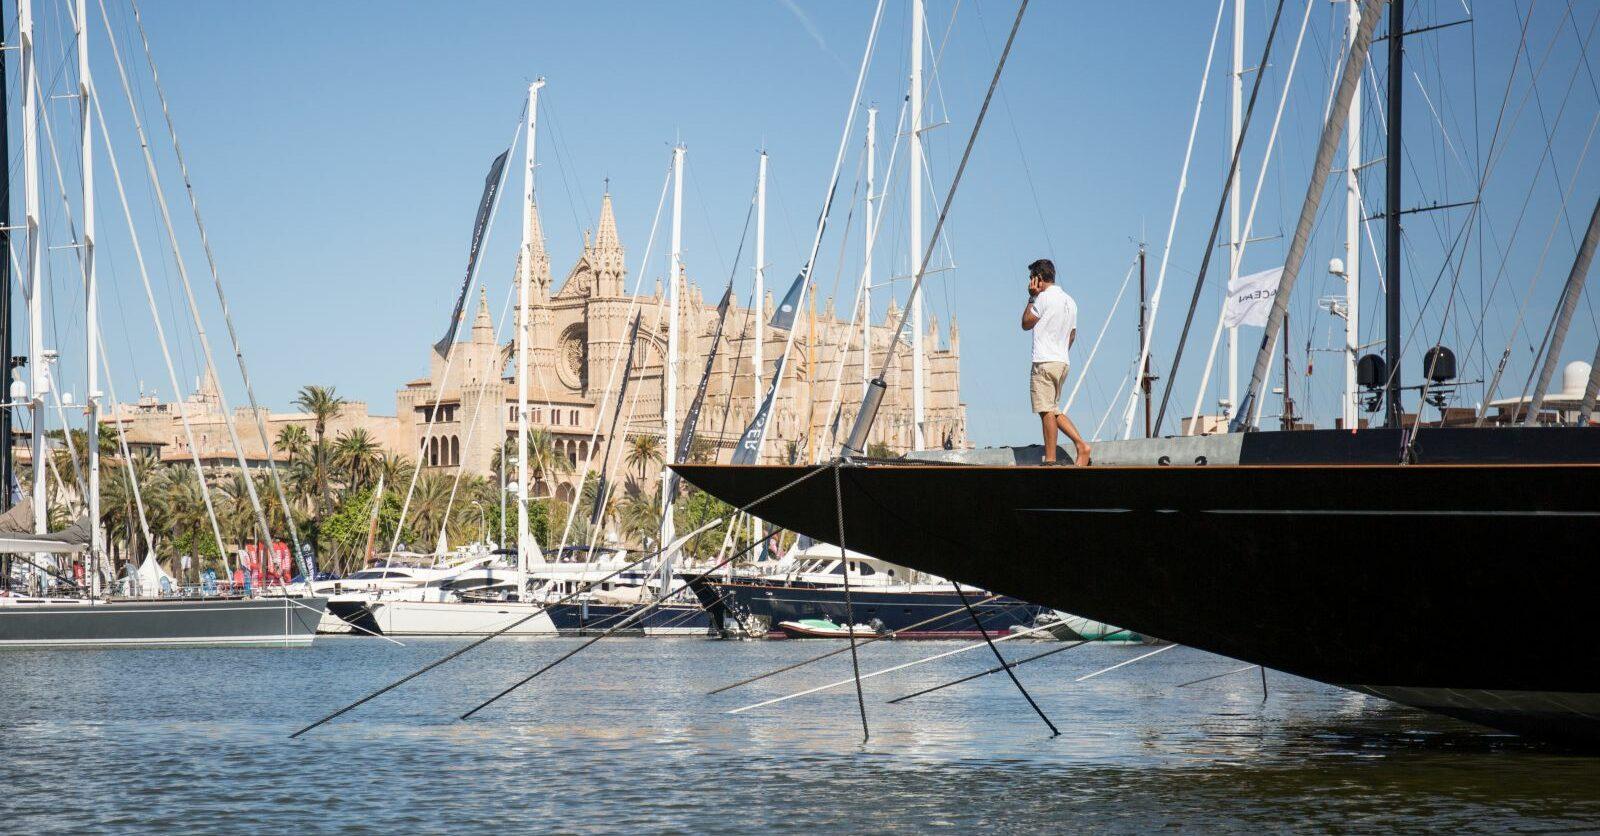 Palma Superyacht Show - Sieckmann Yachts